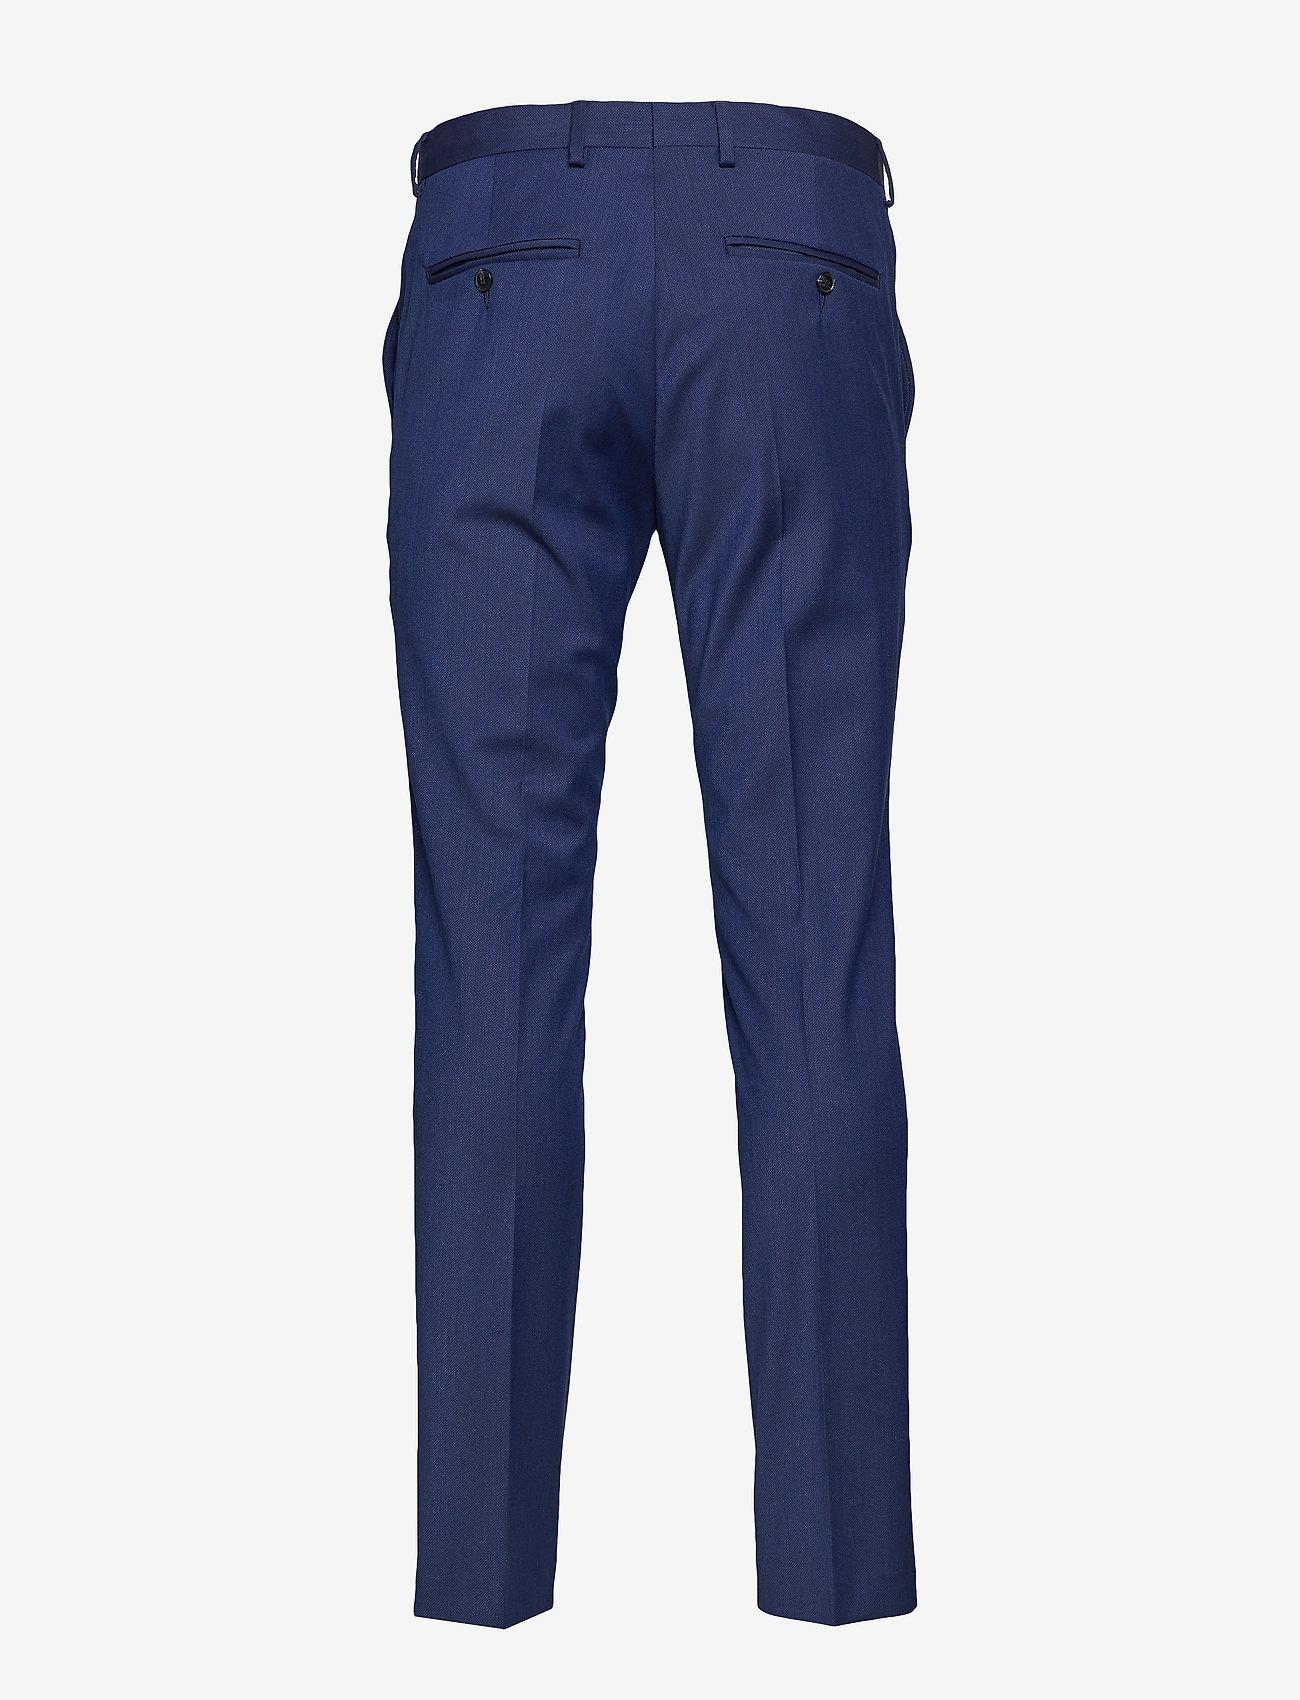 Selected Homme - SLHSLIM-MYLOBILL BLUE TRS B NOOS - suitbukser - blue depths - 1